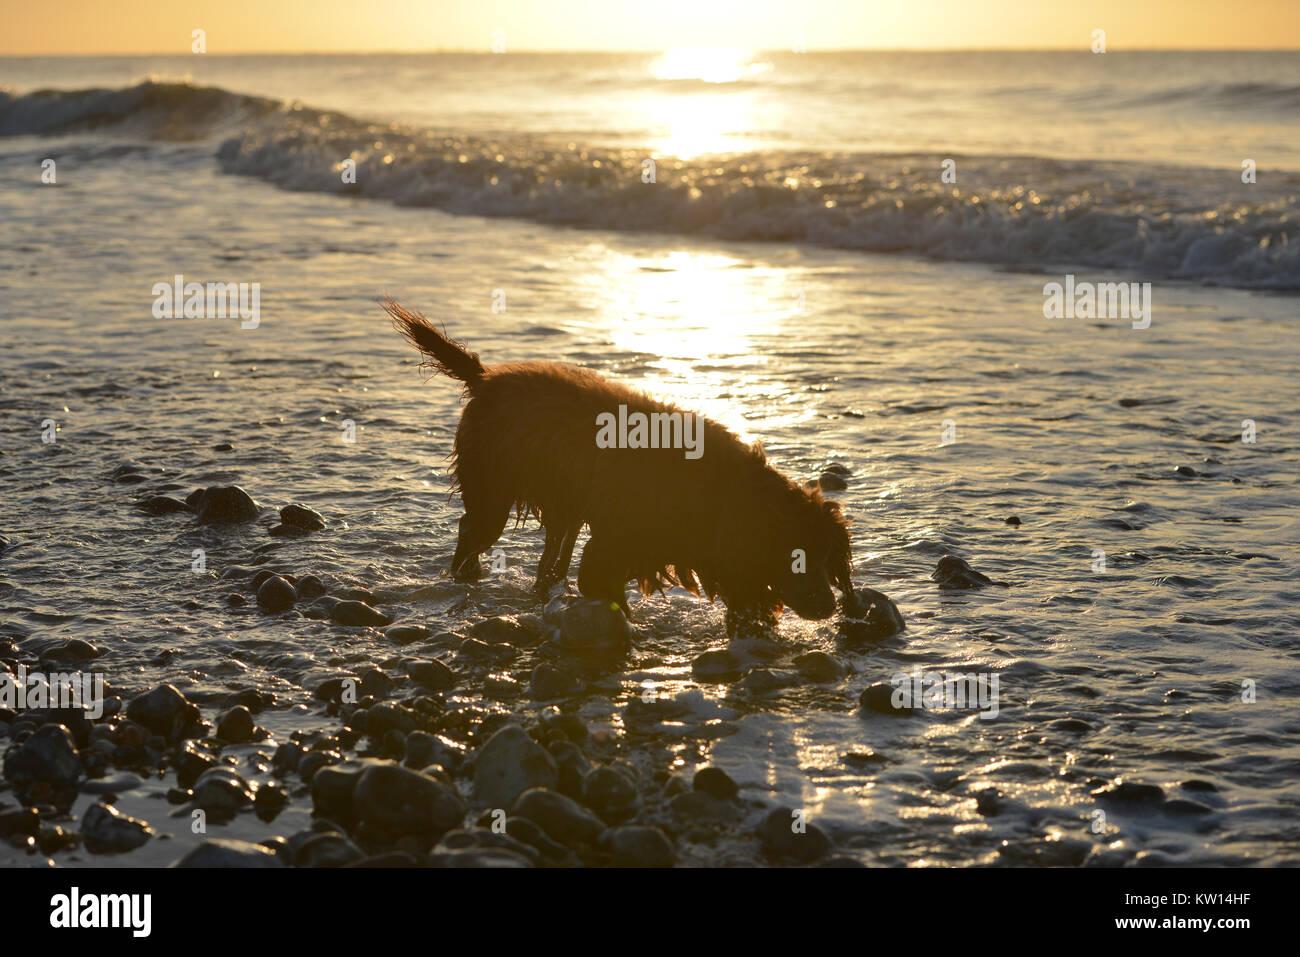 Cocker spaniel walking along a shoreline at sunset/sunrise. - Stock Image